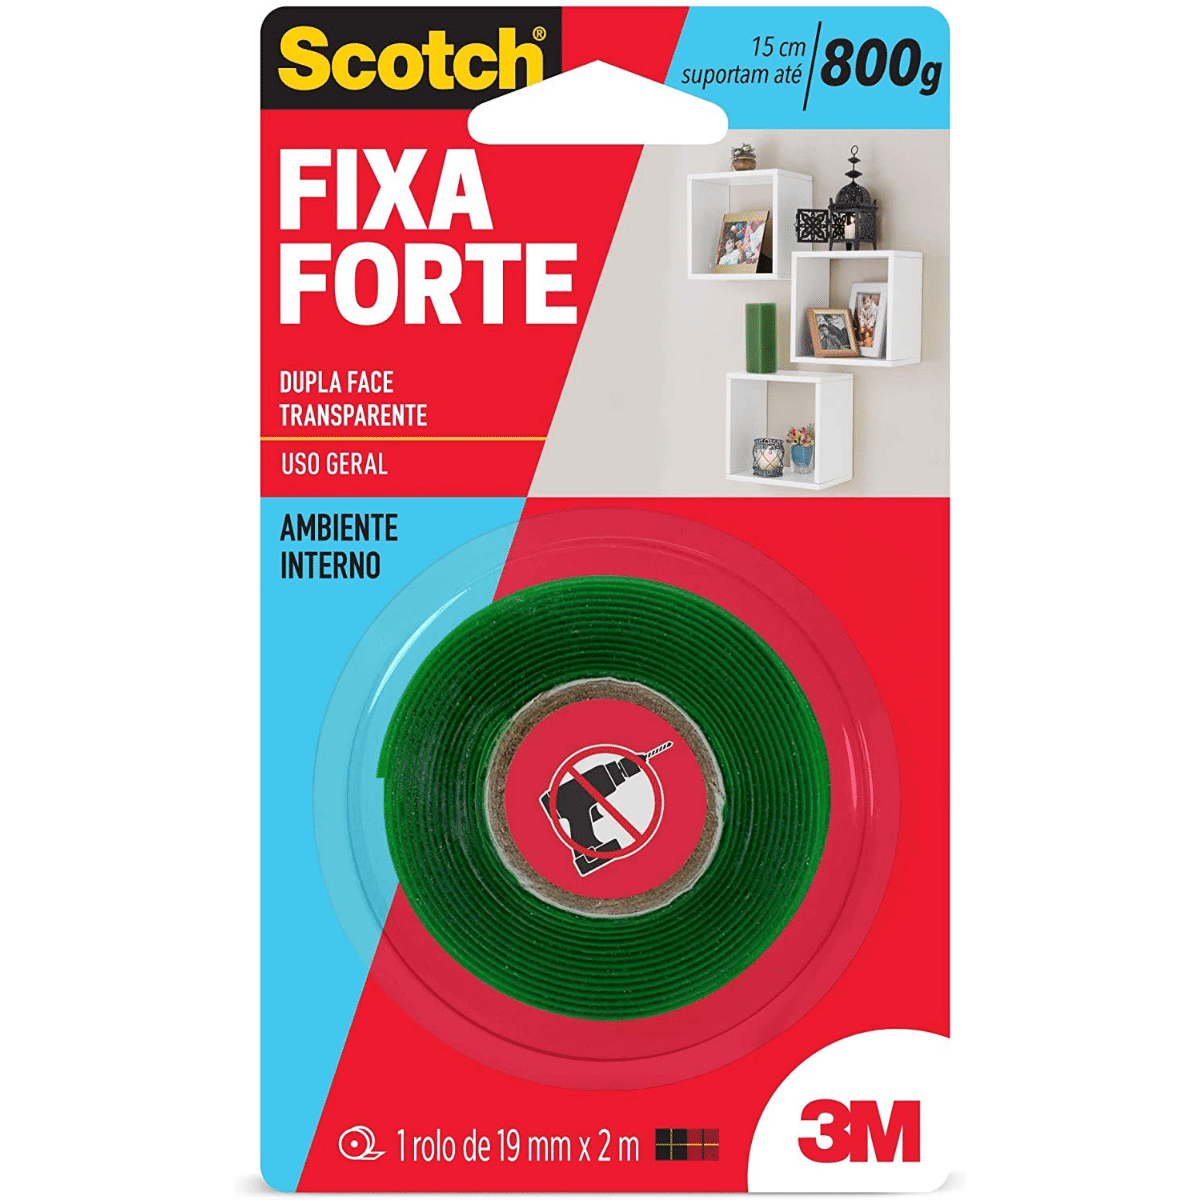 Fita Dupla Face Fixa Forte 19mm X 2m 3m